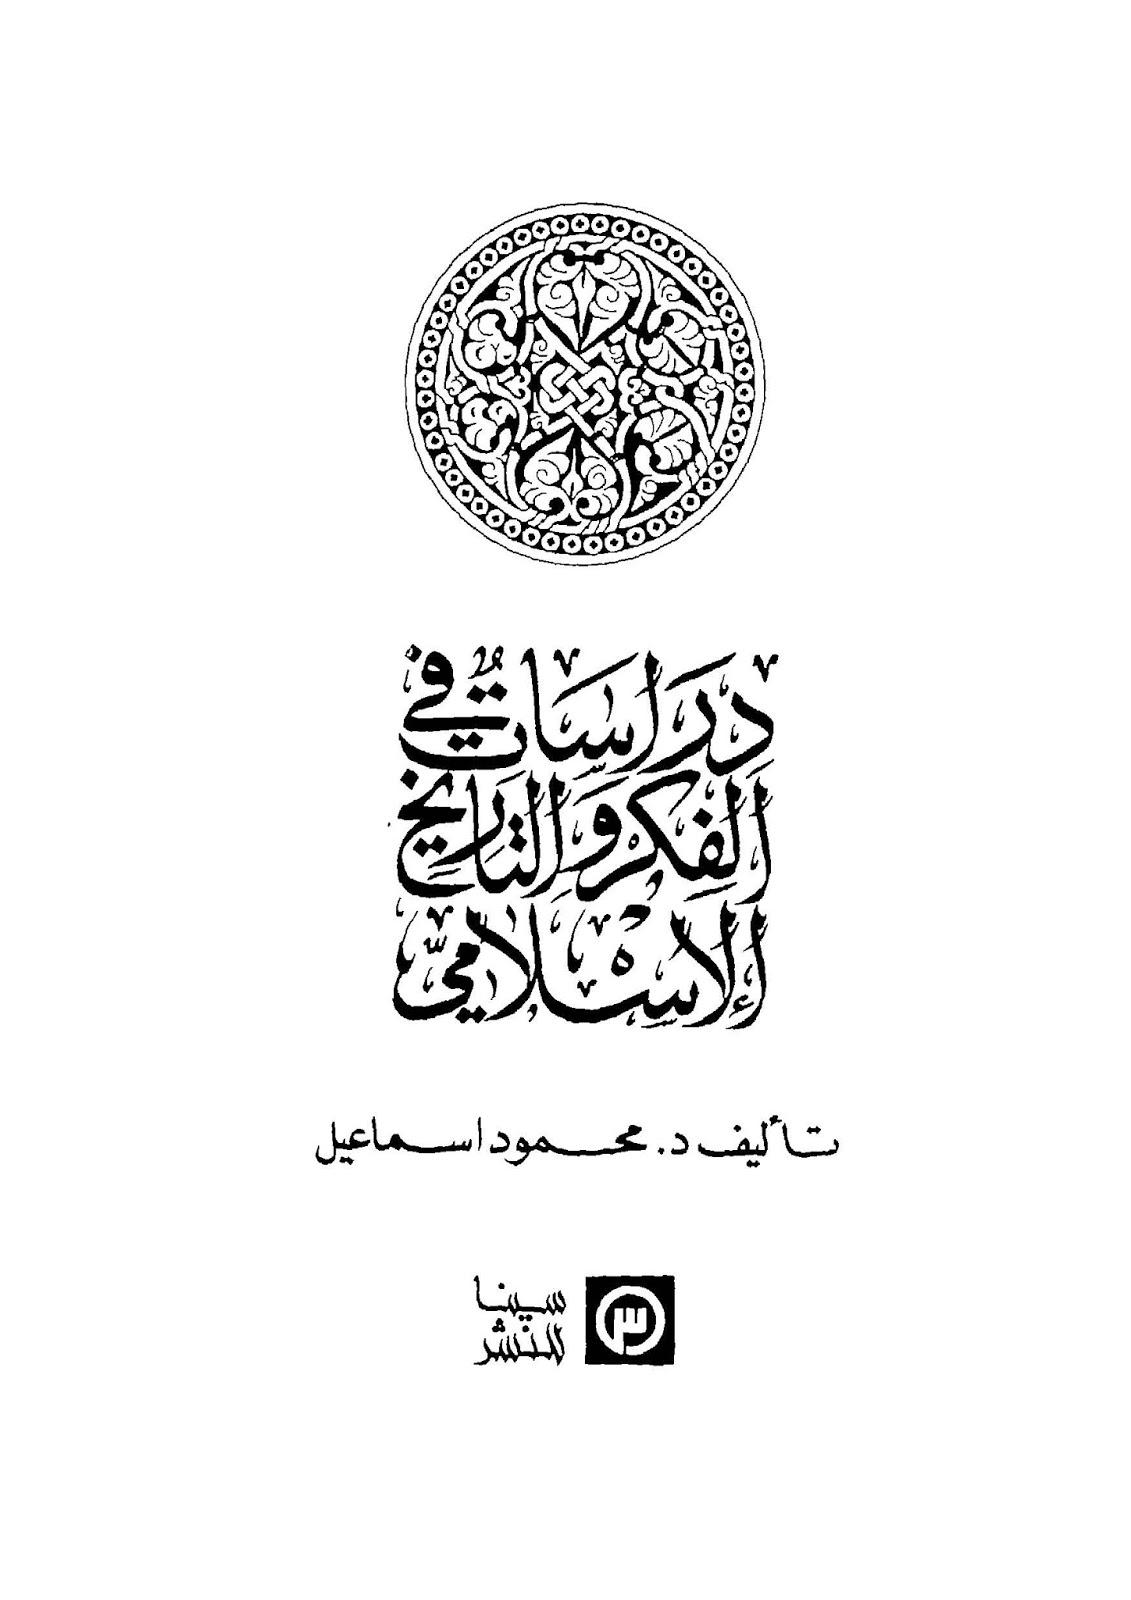 5f14b pages2bde2b00018 - دراسات في الفكر والتاريخ الإسلامي pdf- د.محمود اسماعيل